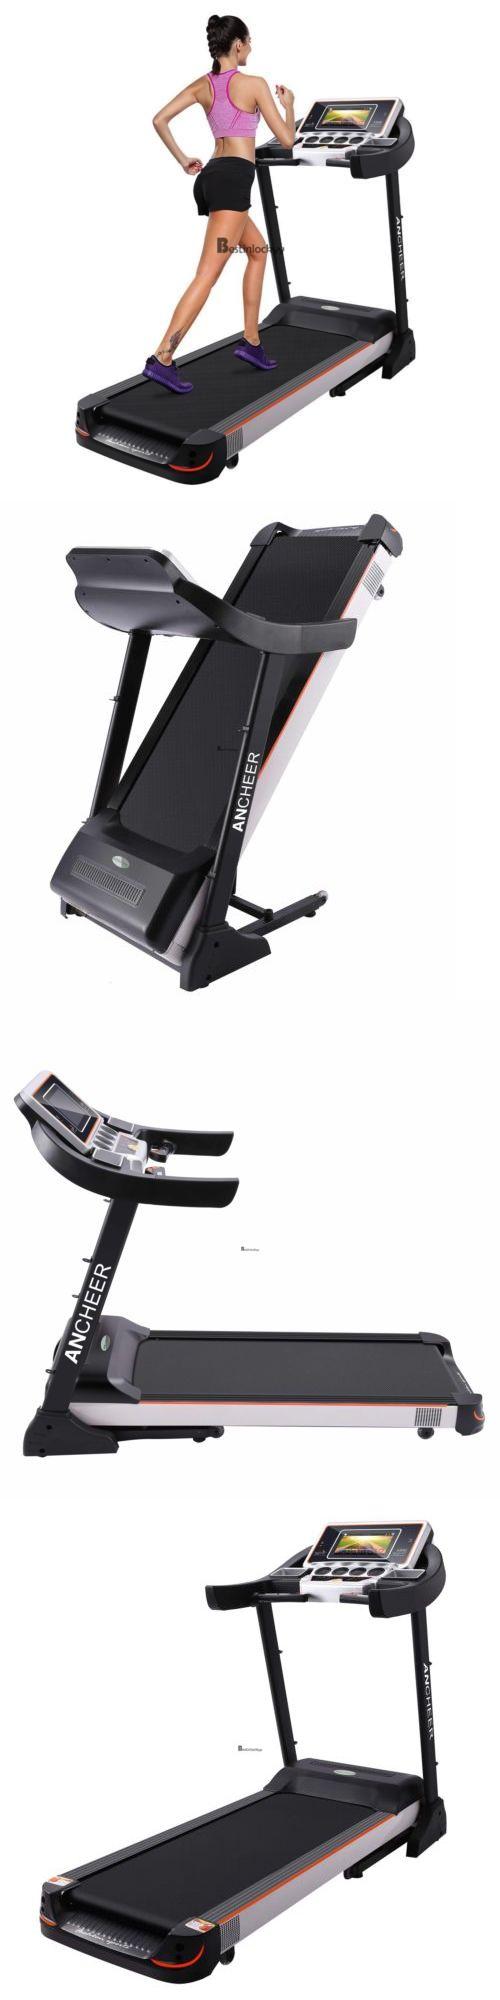 Treadmills 15280: Electric Motorized Bluetooth Mp3 Tv Treadmill Machine Folding Running Fitness -> BUY IT NOW ONLY: $699.99 on eBay!